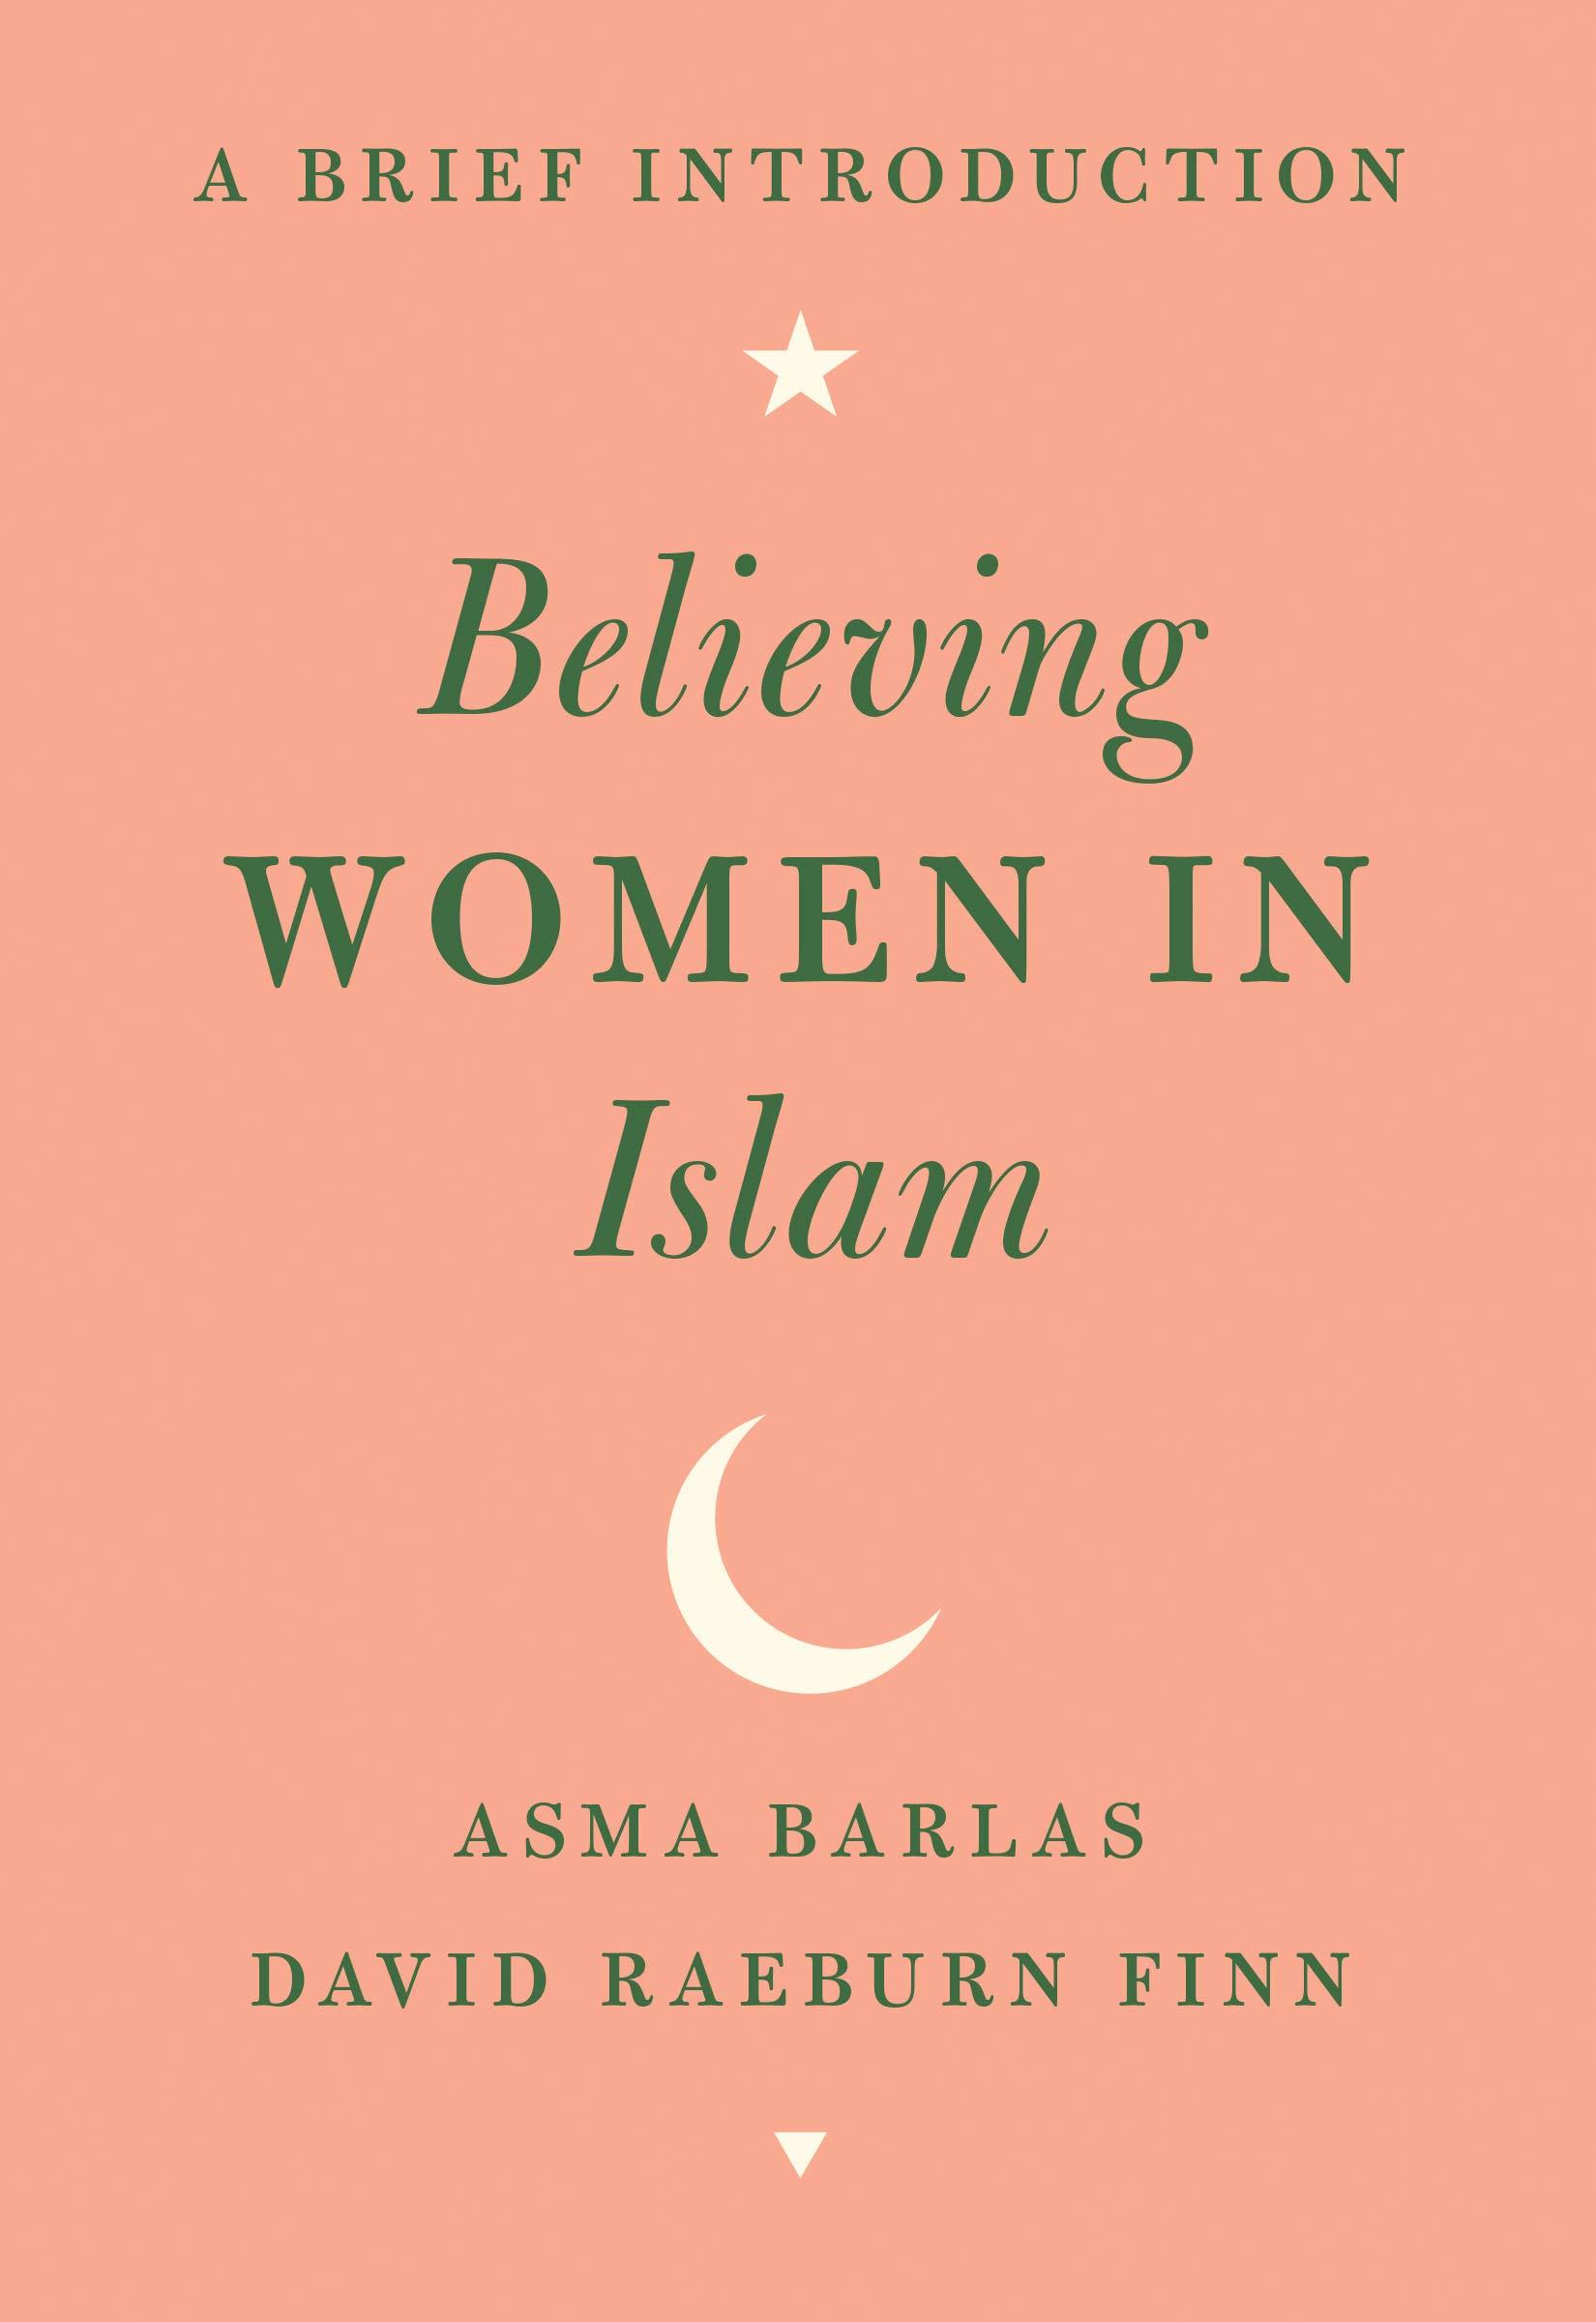 Believing Women in Islam: A Brief Introduction by Asma Barlas, David Raeburn Finn